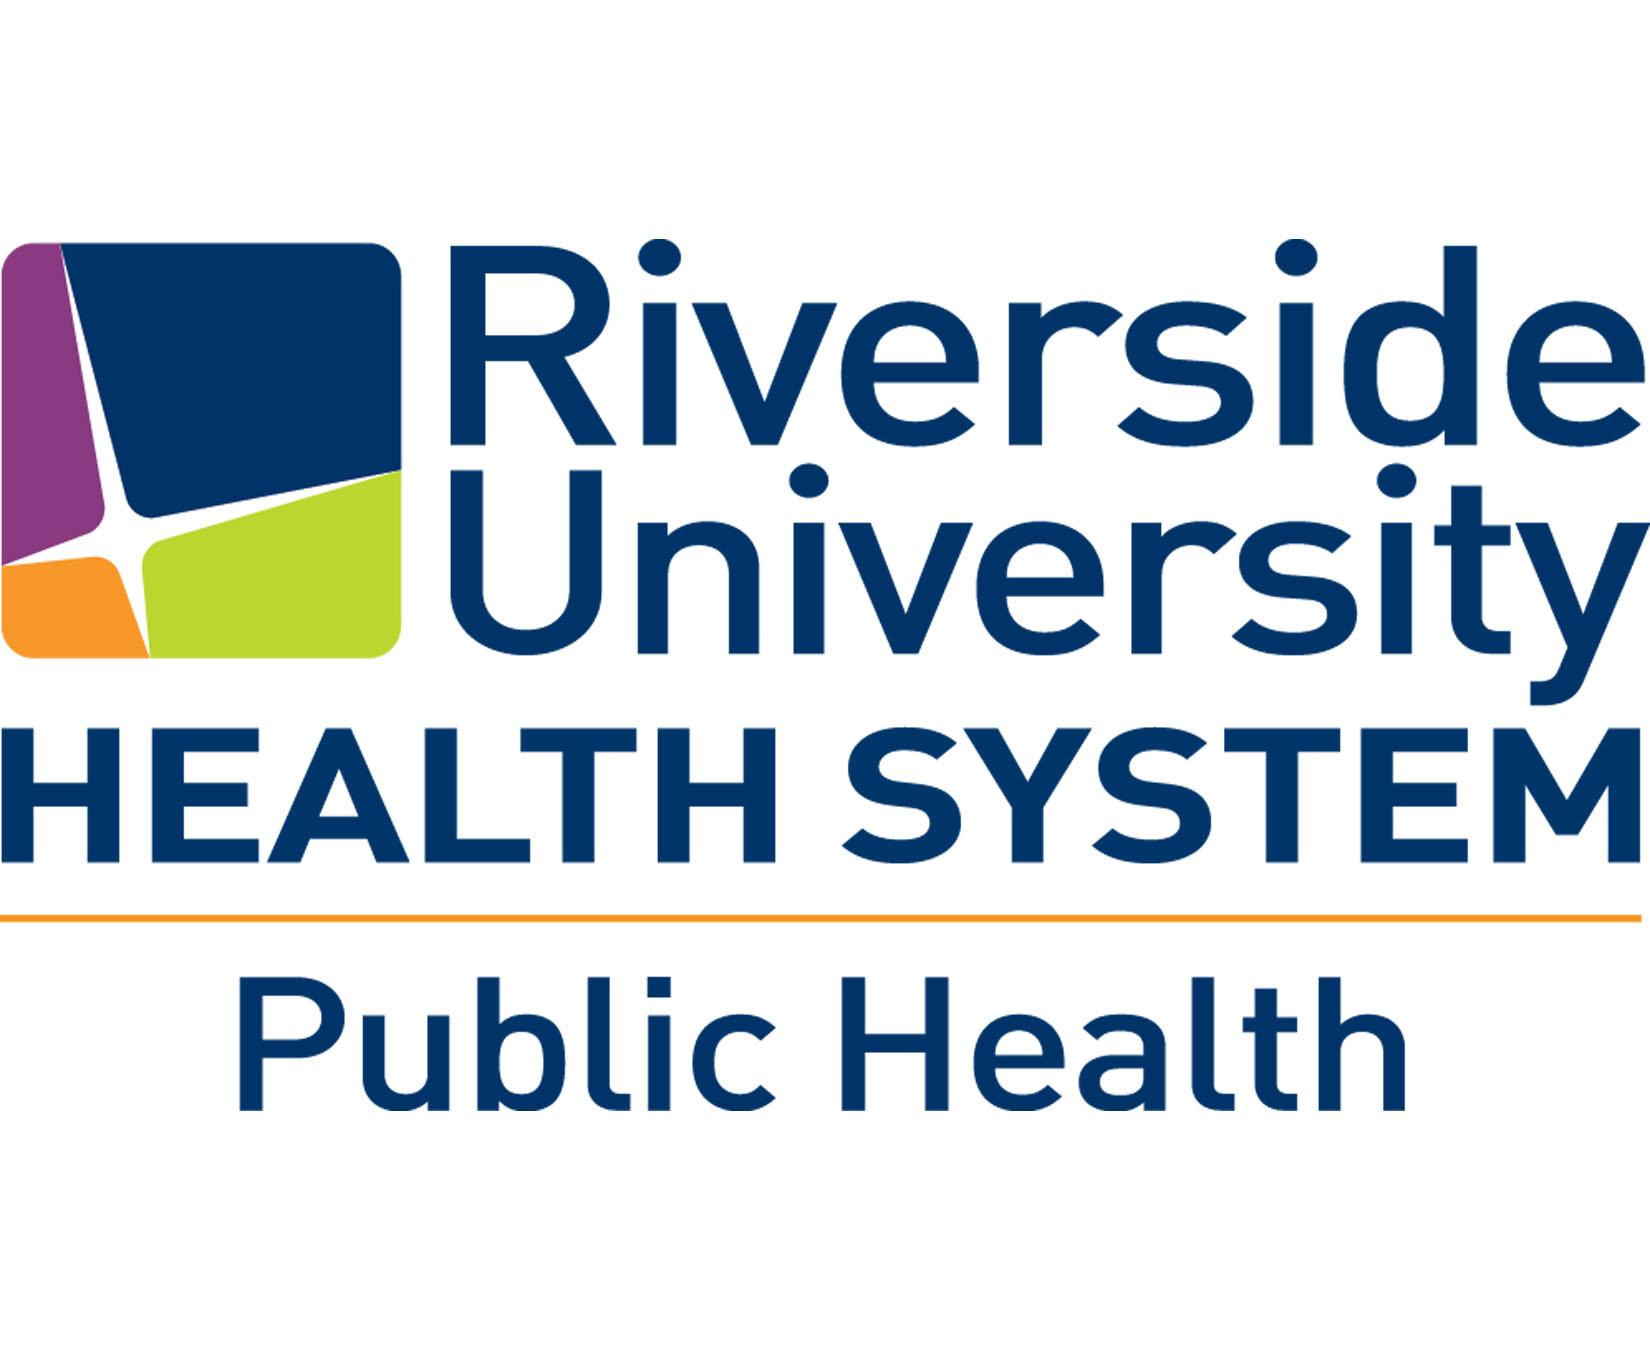 Riverside University Logo